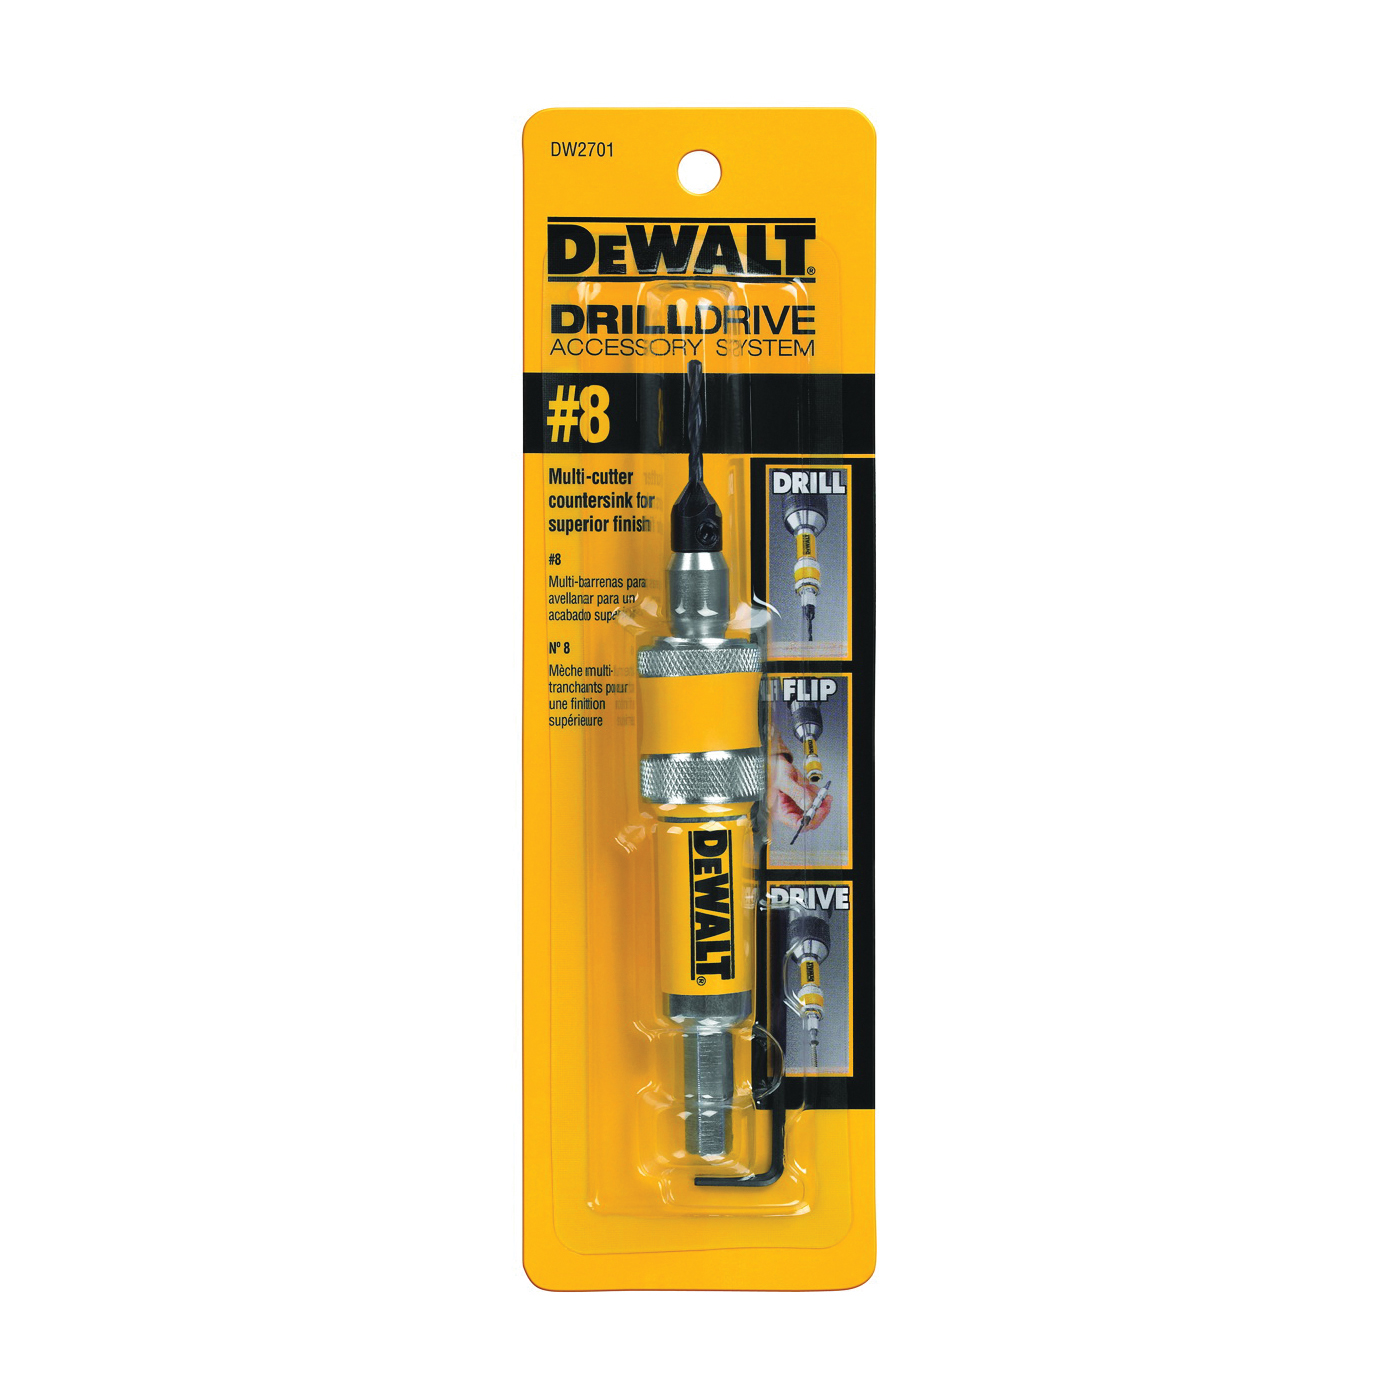 Picture of DeWALT DW2701 Drill/Drive Set, Steel, Yellow, Black Oxide